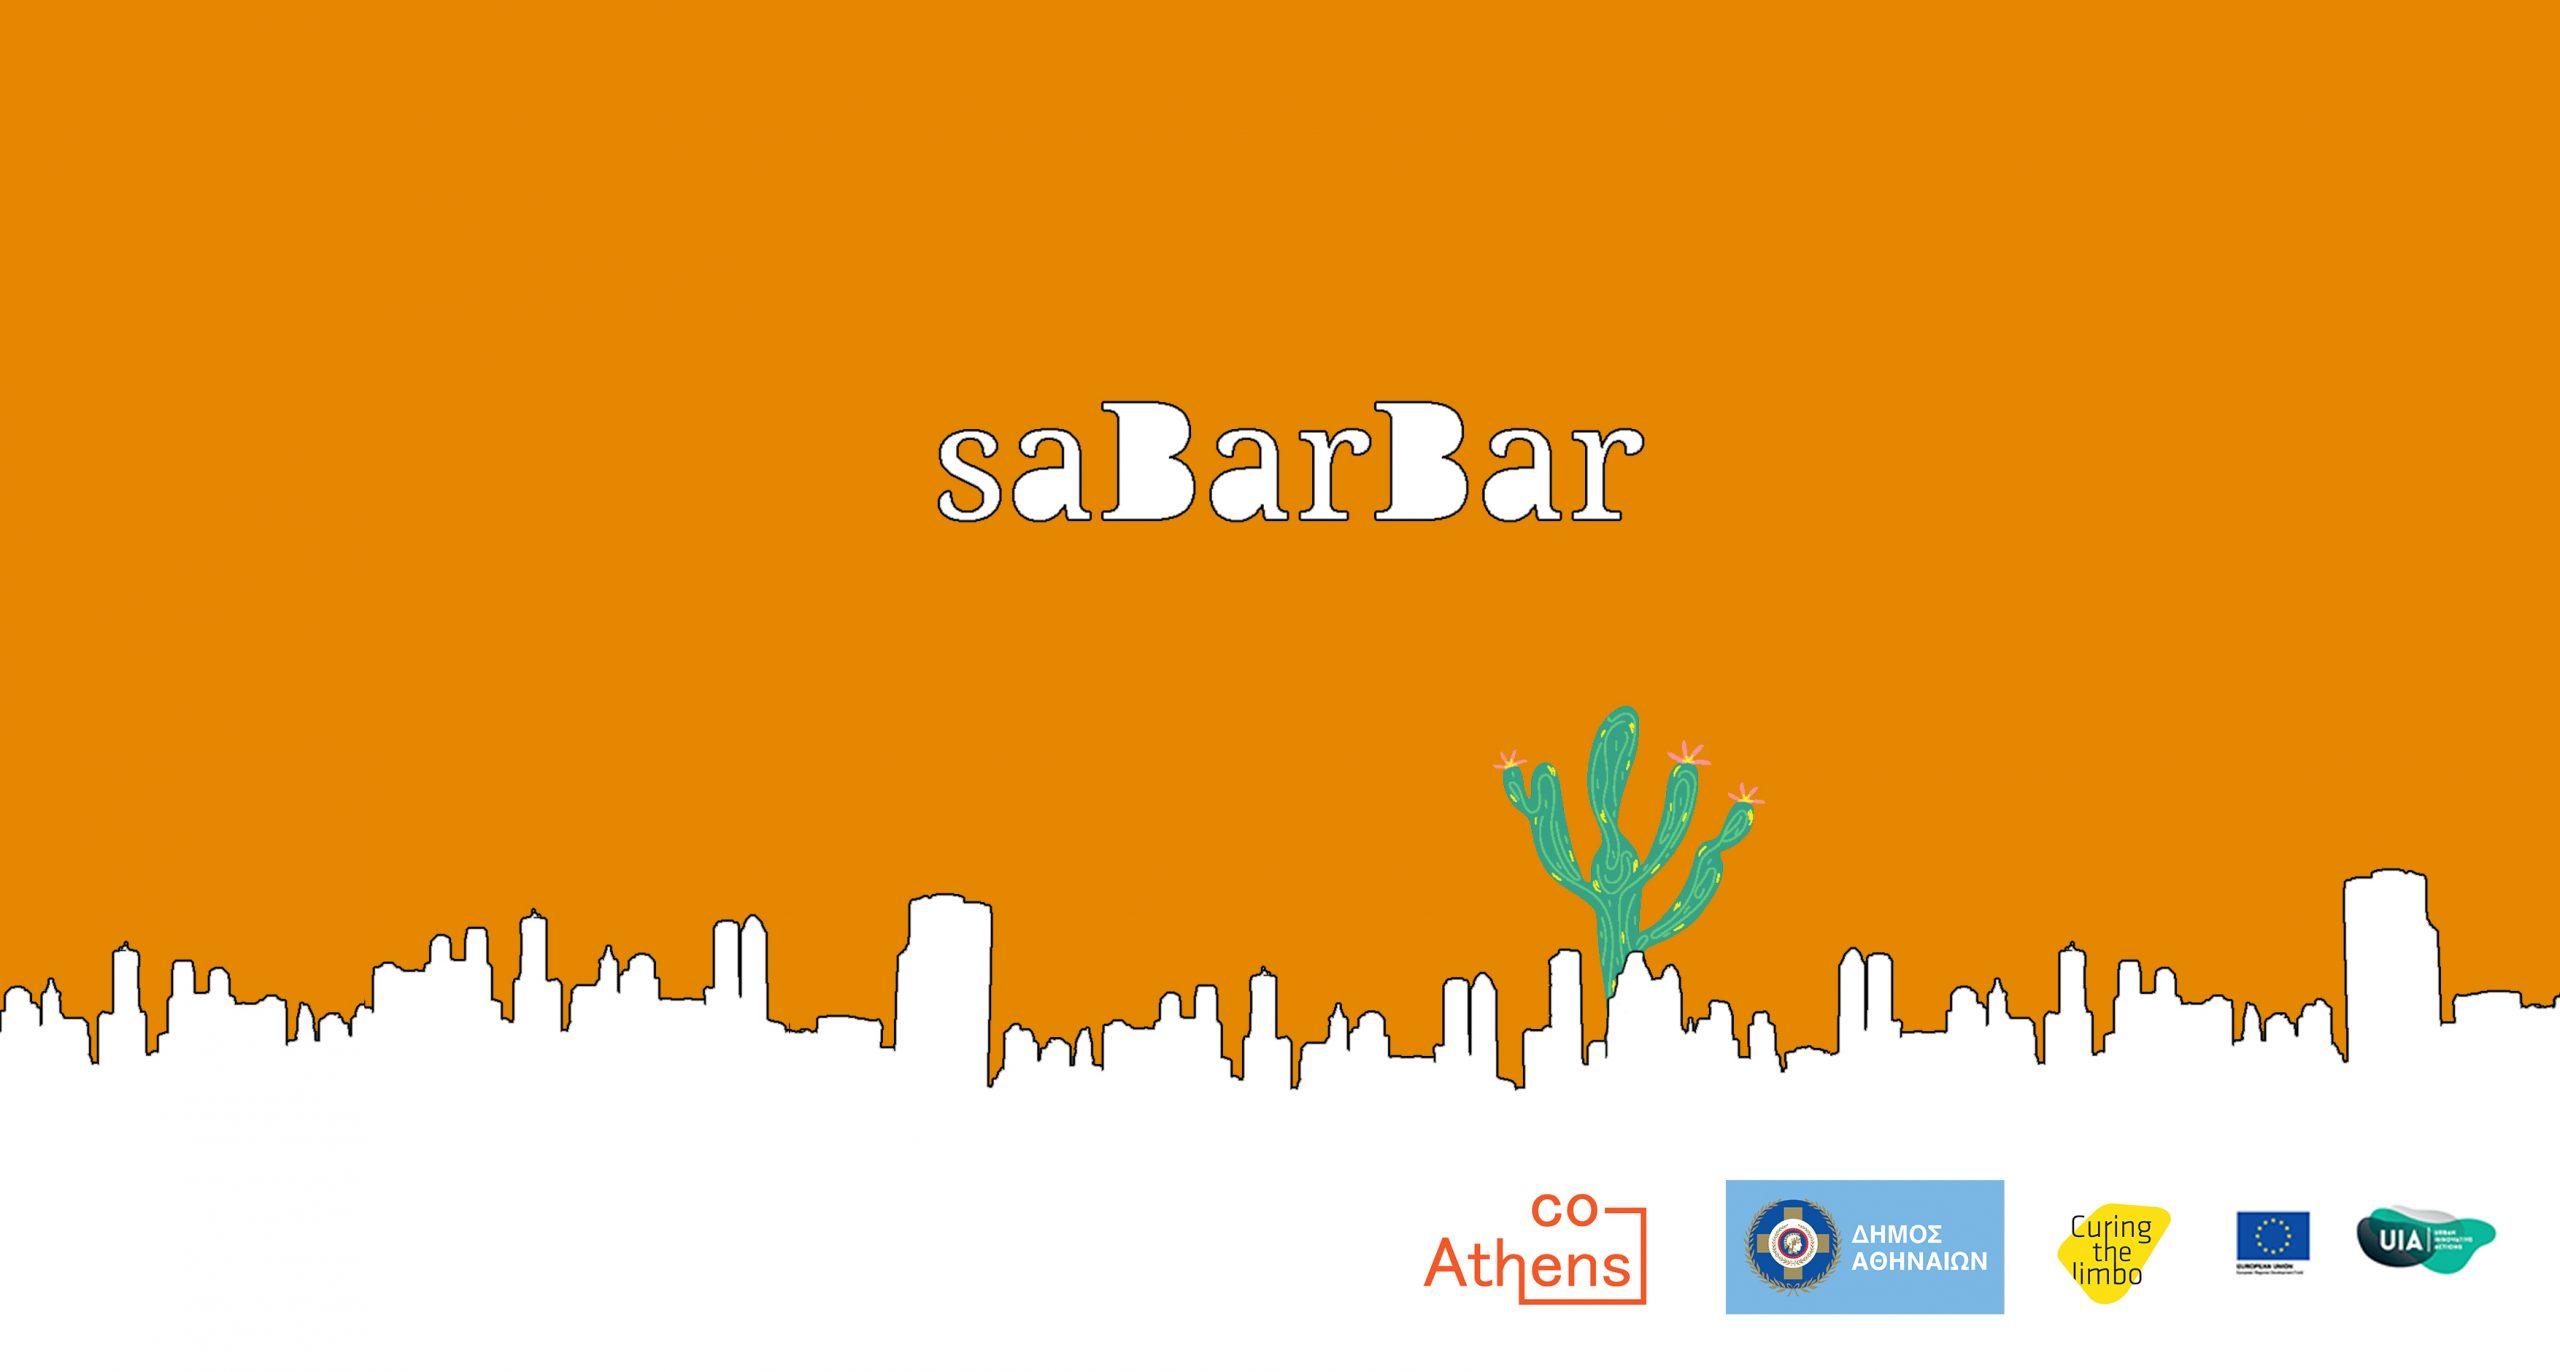 sabarbar_project_fabrica_athens_oxi_paizoume_team_teamwork_co_athens_curing_the_limbo